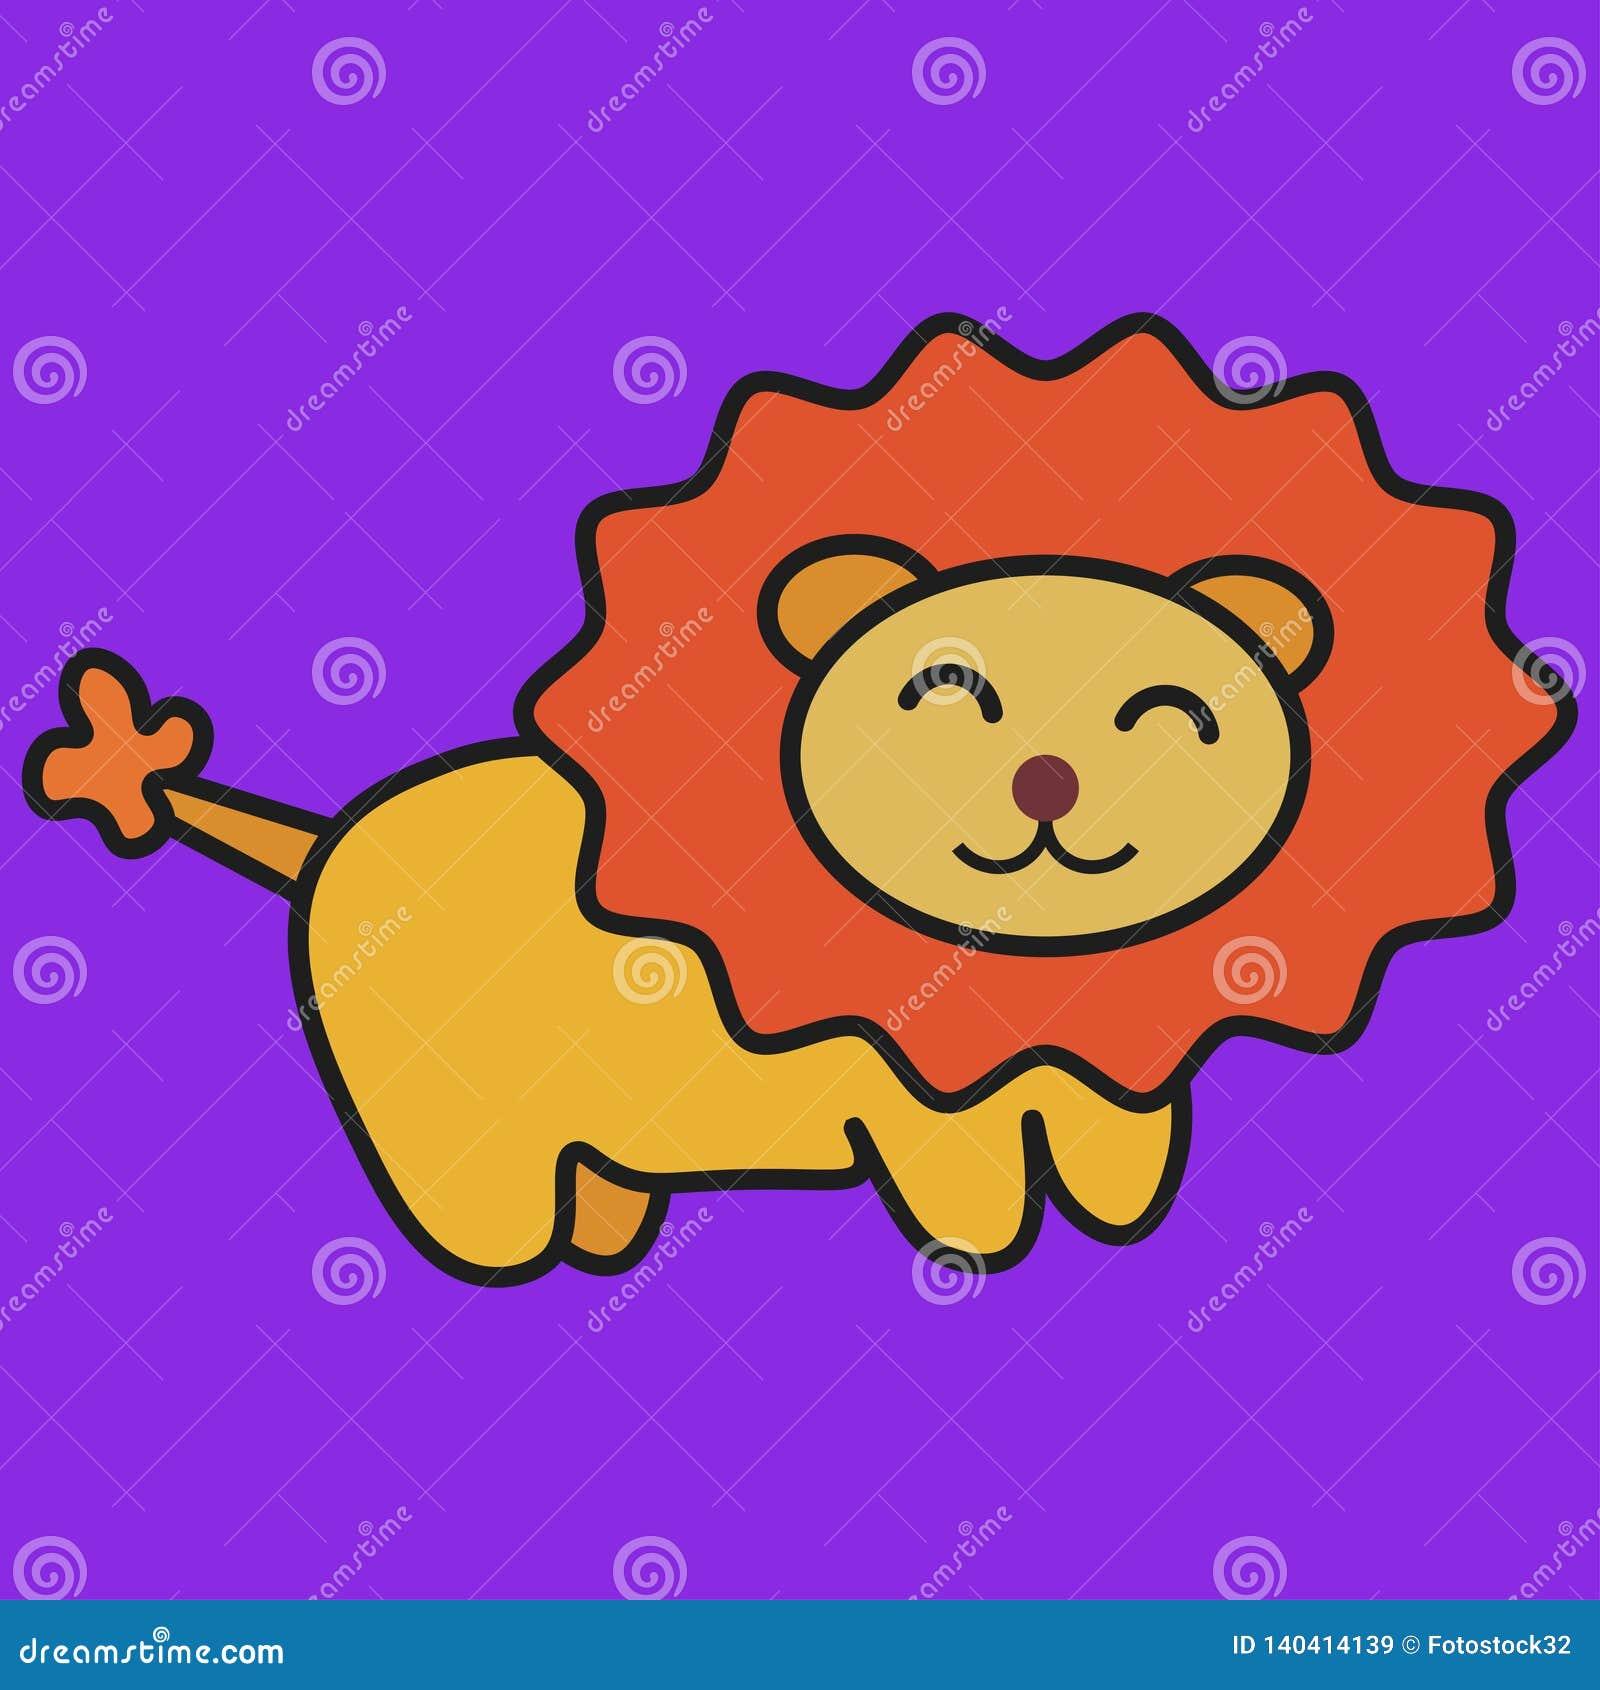 Lion in cartoon style